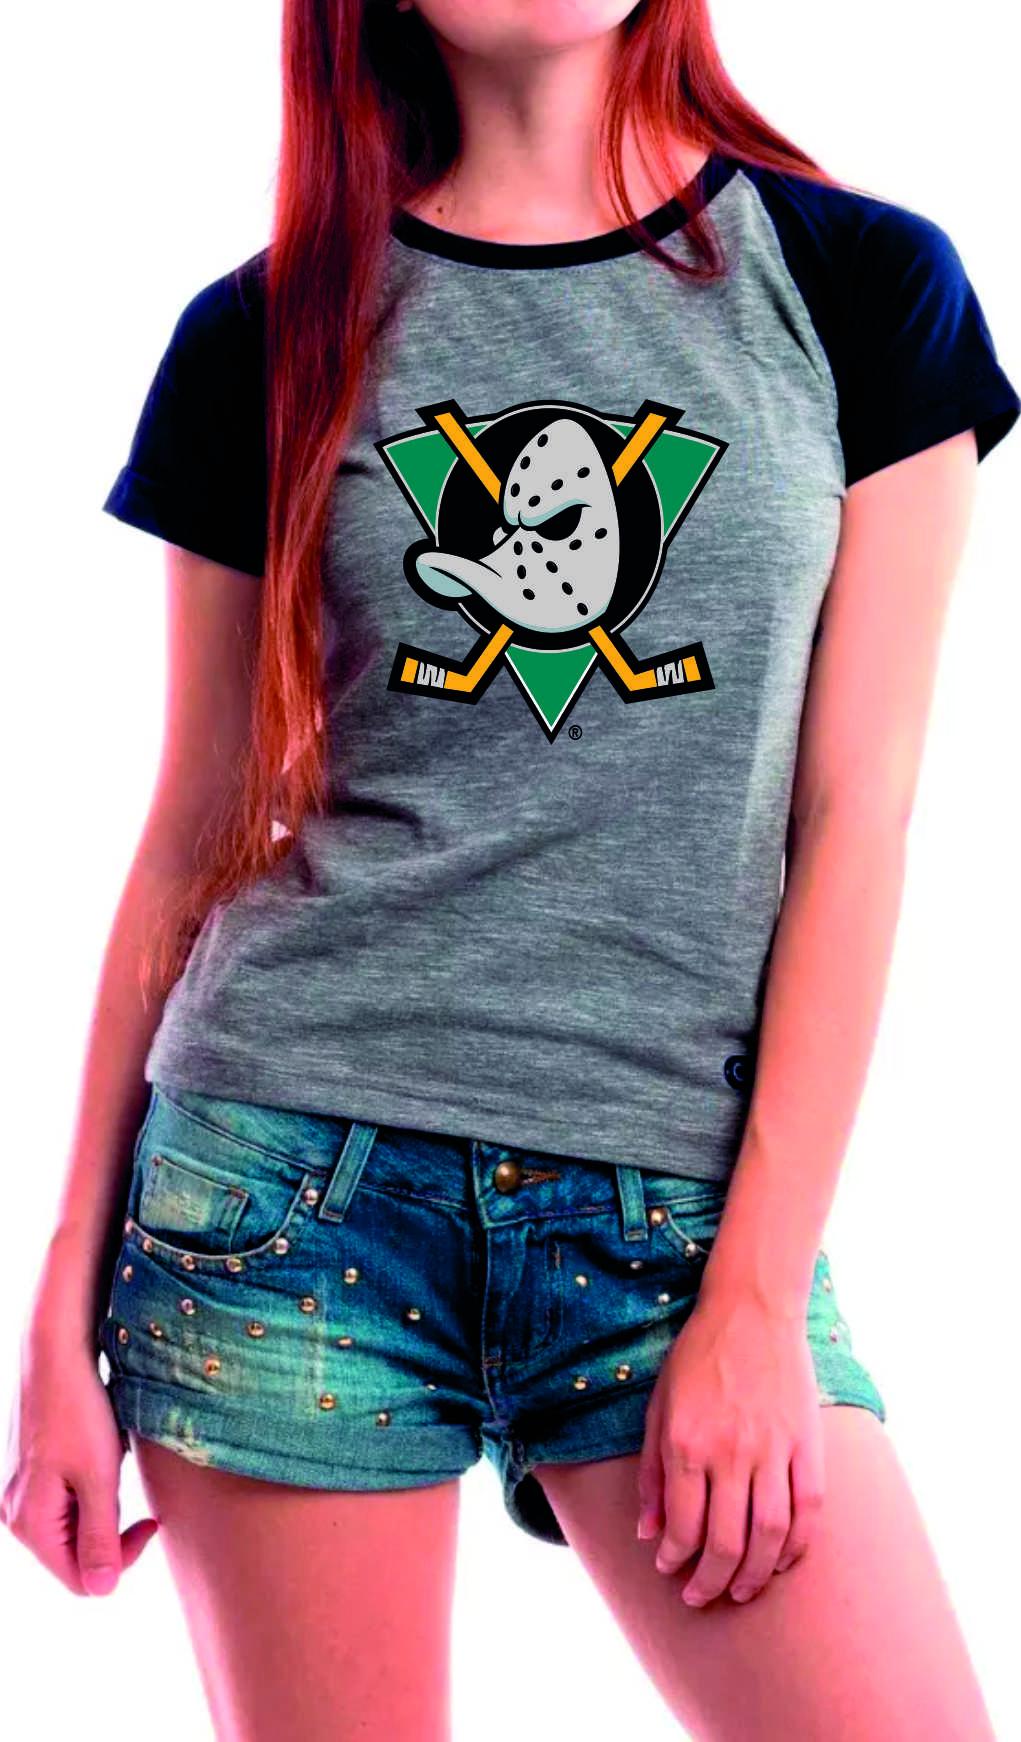 09b42ff68 Camiseta Raglan Baby Look Los Angeles Lakers no Elo7